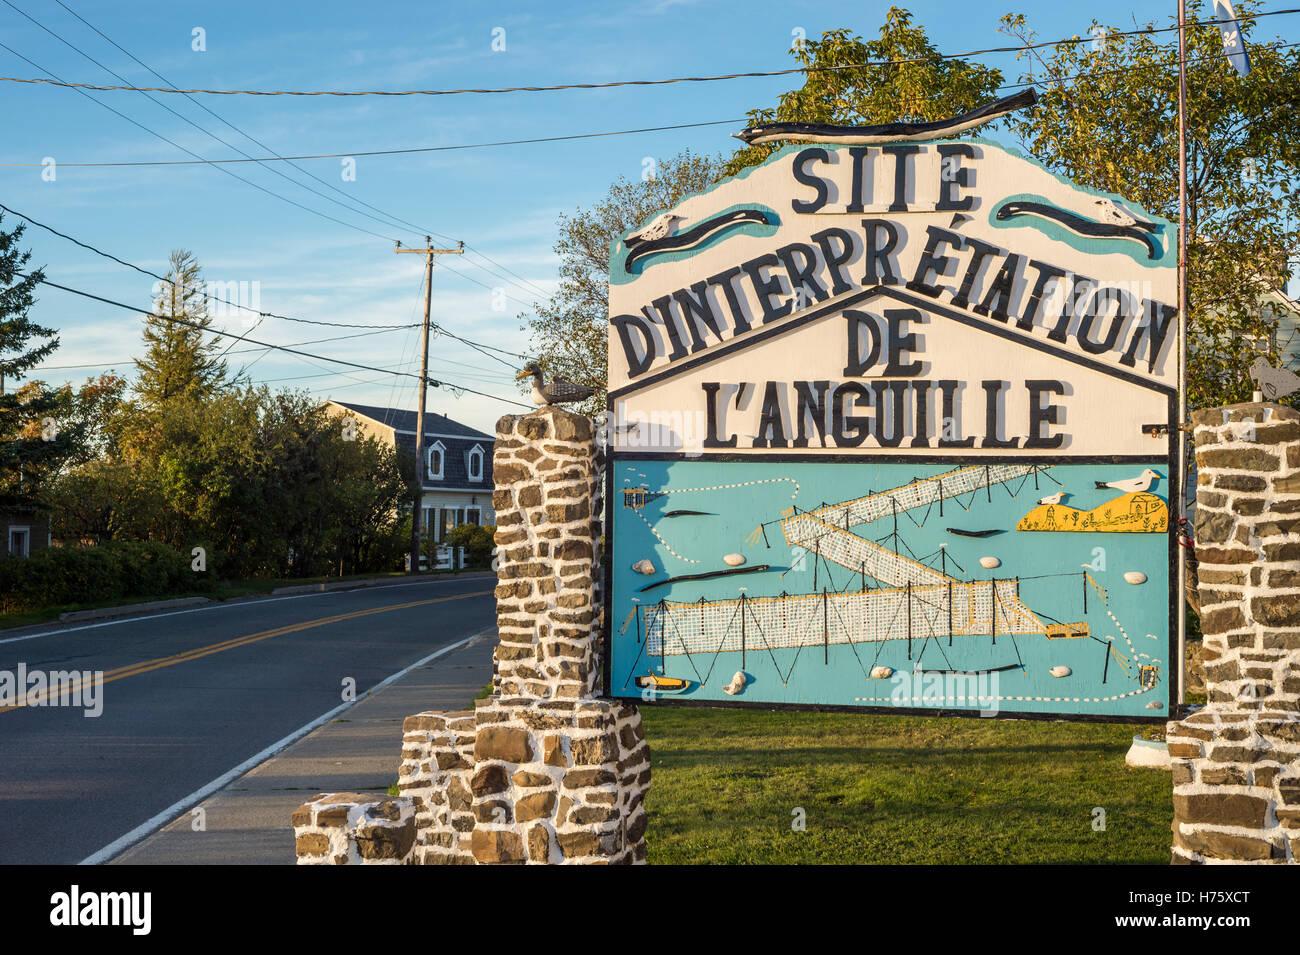 Eel interpretive Centre in Kamouraska, Quebec, Canada - Stock Image